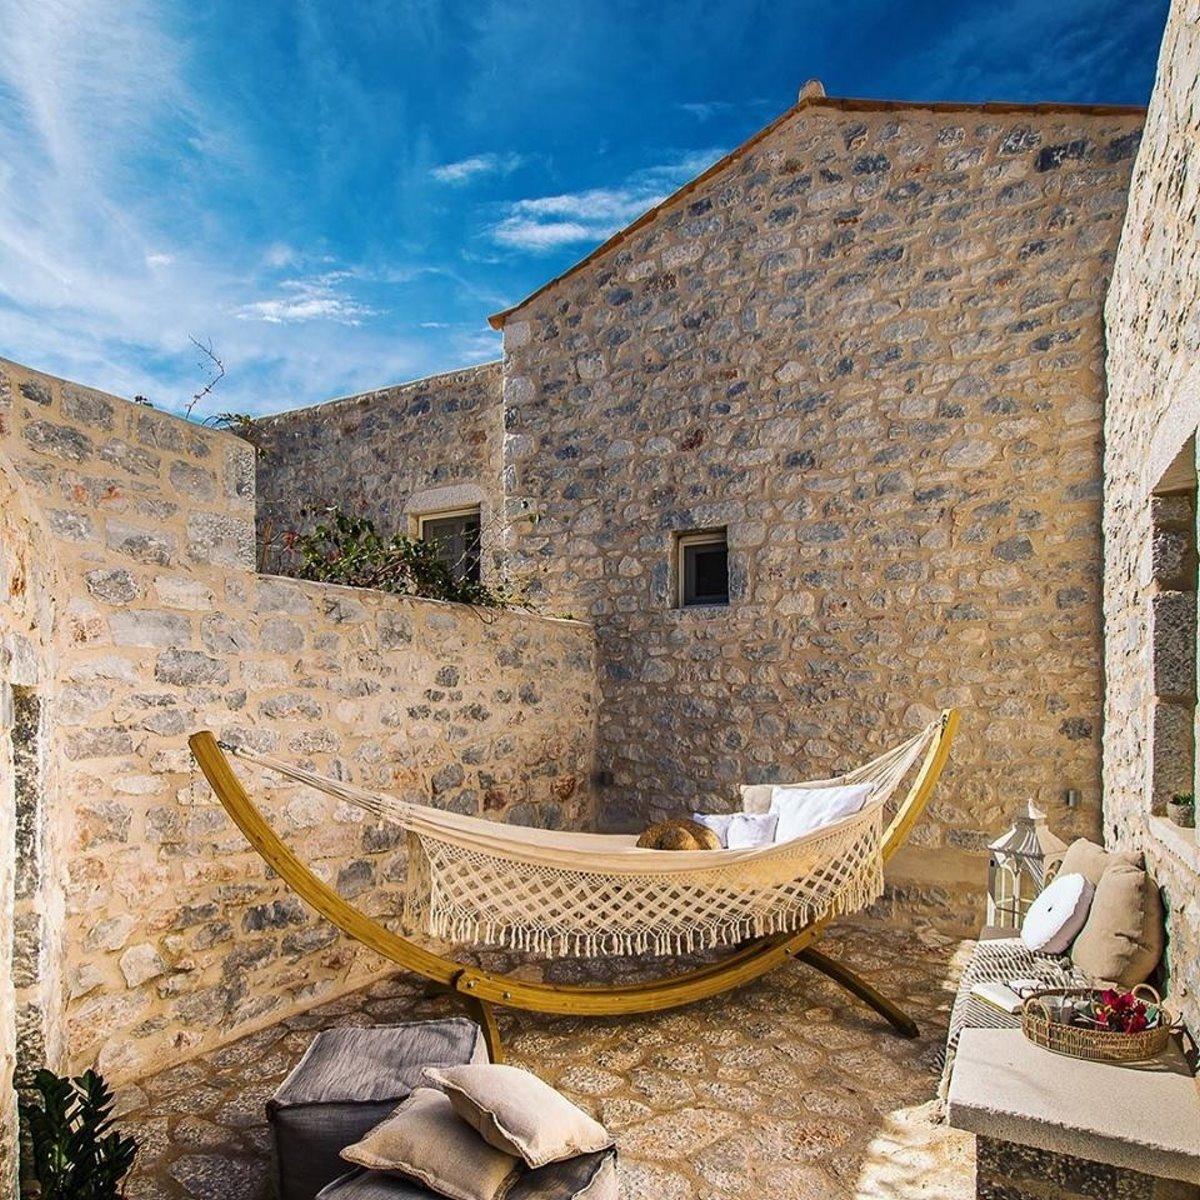 Bassa Maina ξενώνας Αρεόπολη με την αιώρα στην βεράντα